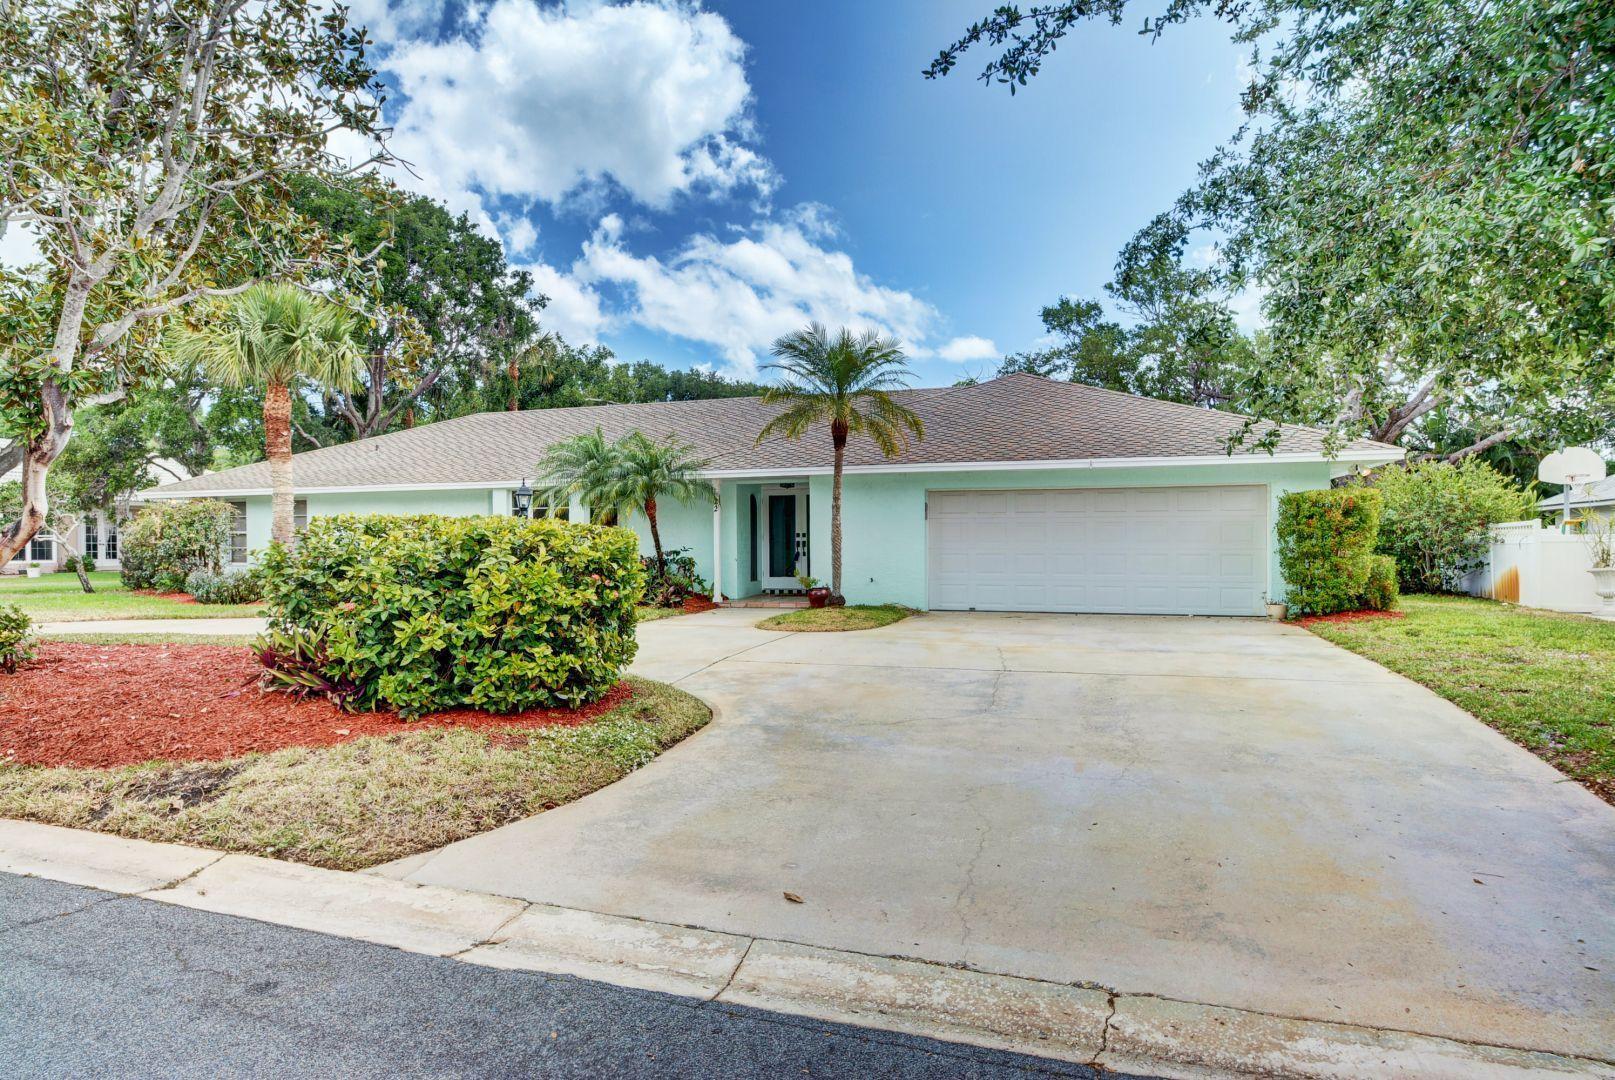 22 Banyan Road, Sewalls Point, Florida 34996, 4 Bedrooms Bedrooms, ,3.1 BathroomsBathrooms,Single Family,For Sale,Banyan,RX-10421944